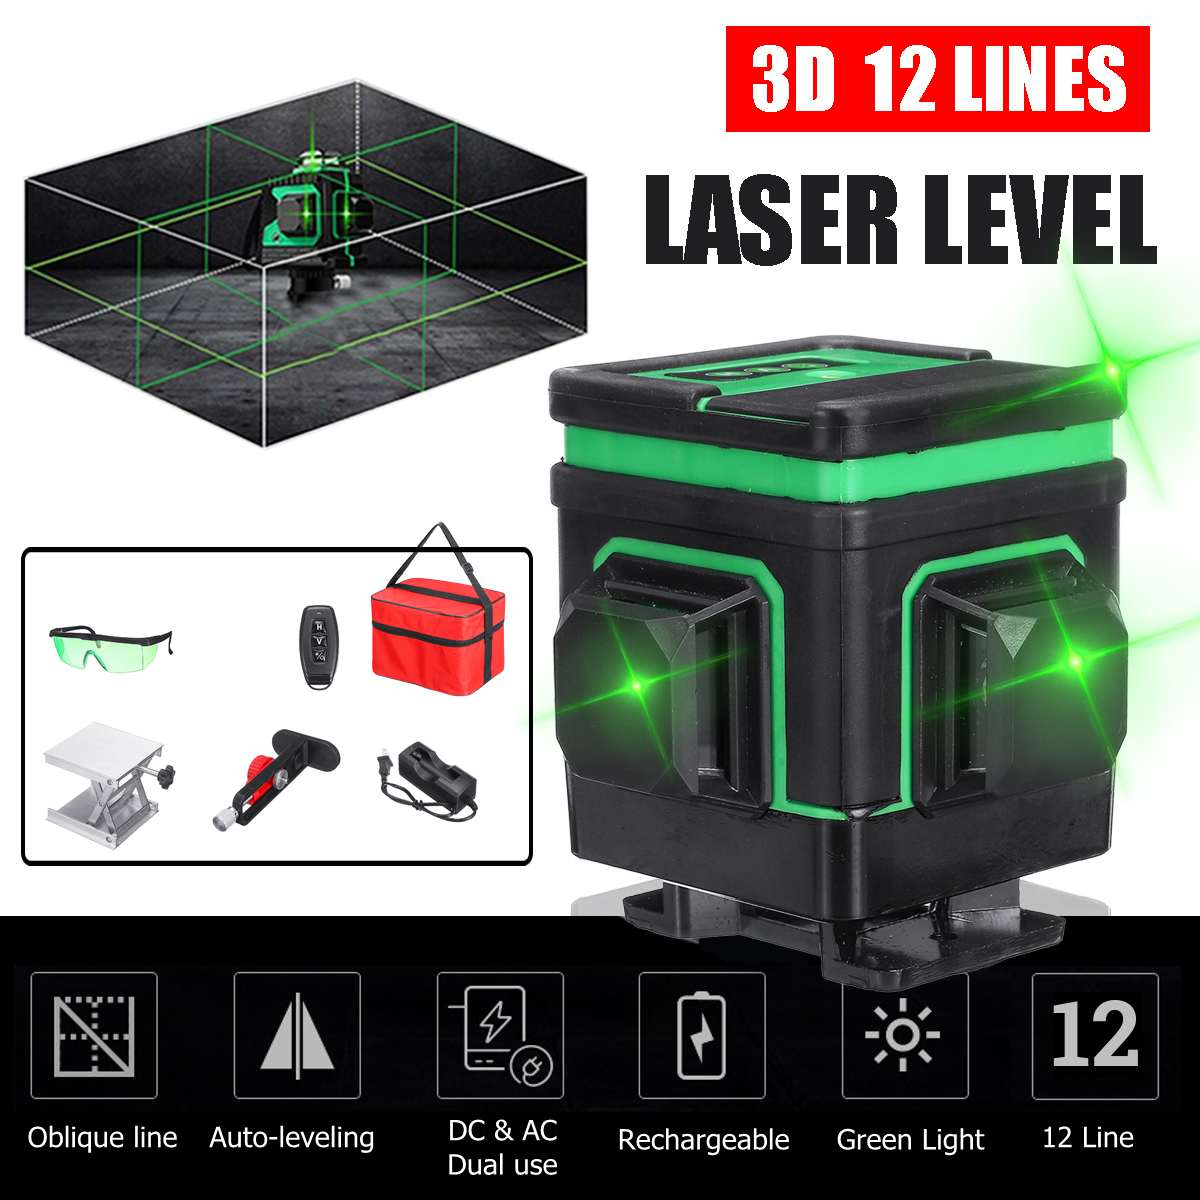 3D láser Nivel 12 líneas 360 rotativo Nivel láser trípode para Nivel Lazer receptor soporte herramientas de construcción